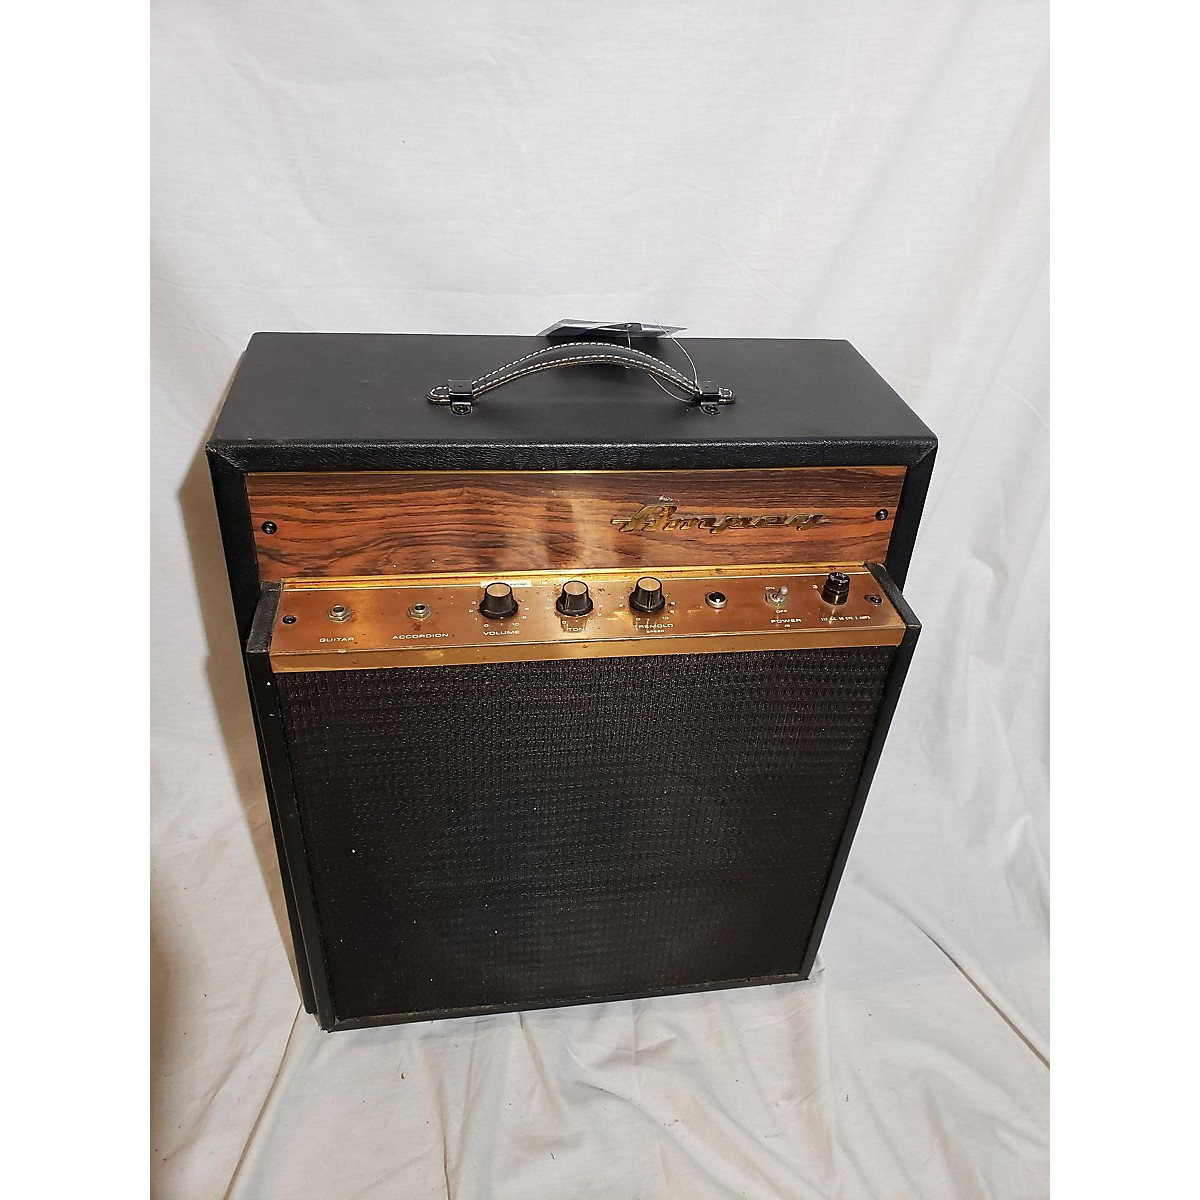 Ampeg 1967 Jet 2 Goldenglo Tube Guitar Combo Amp